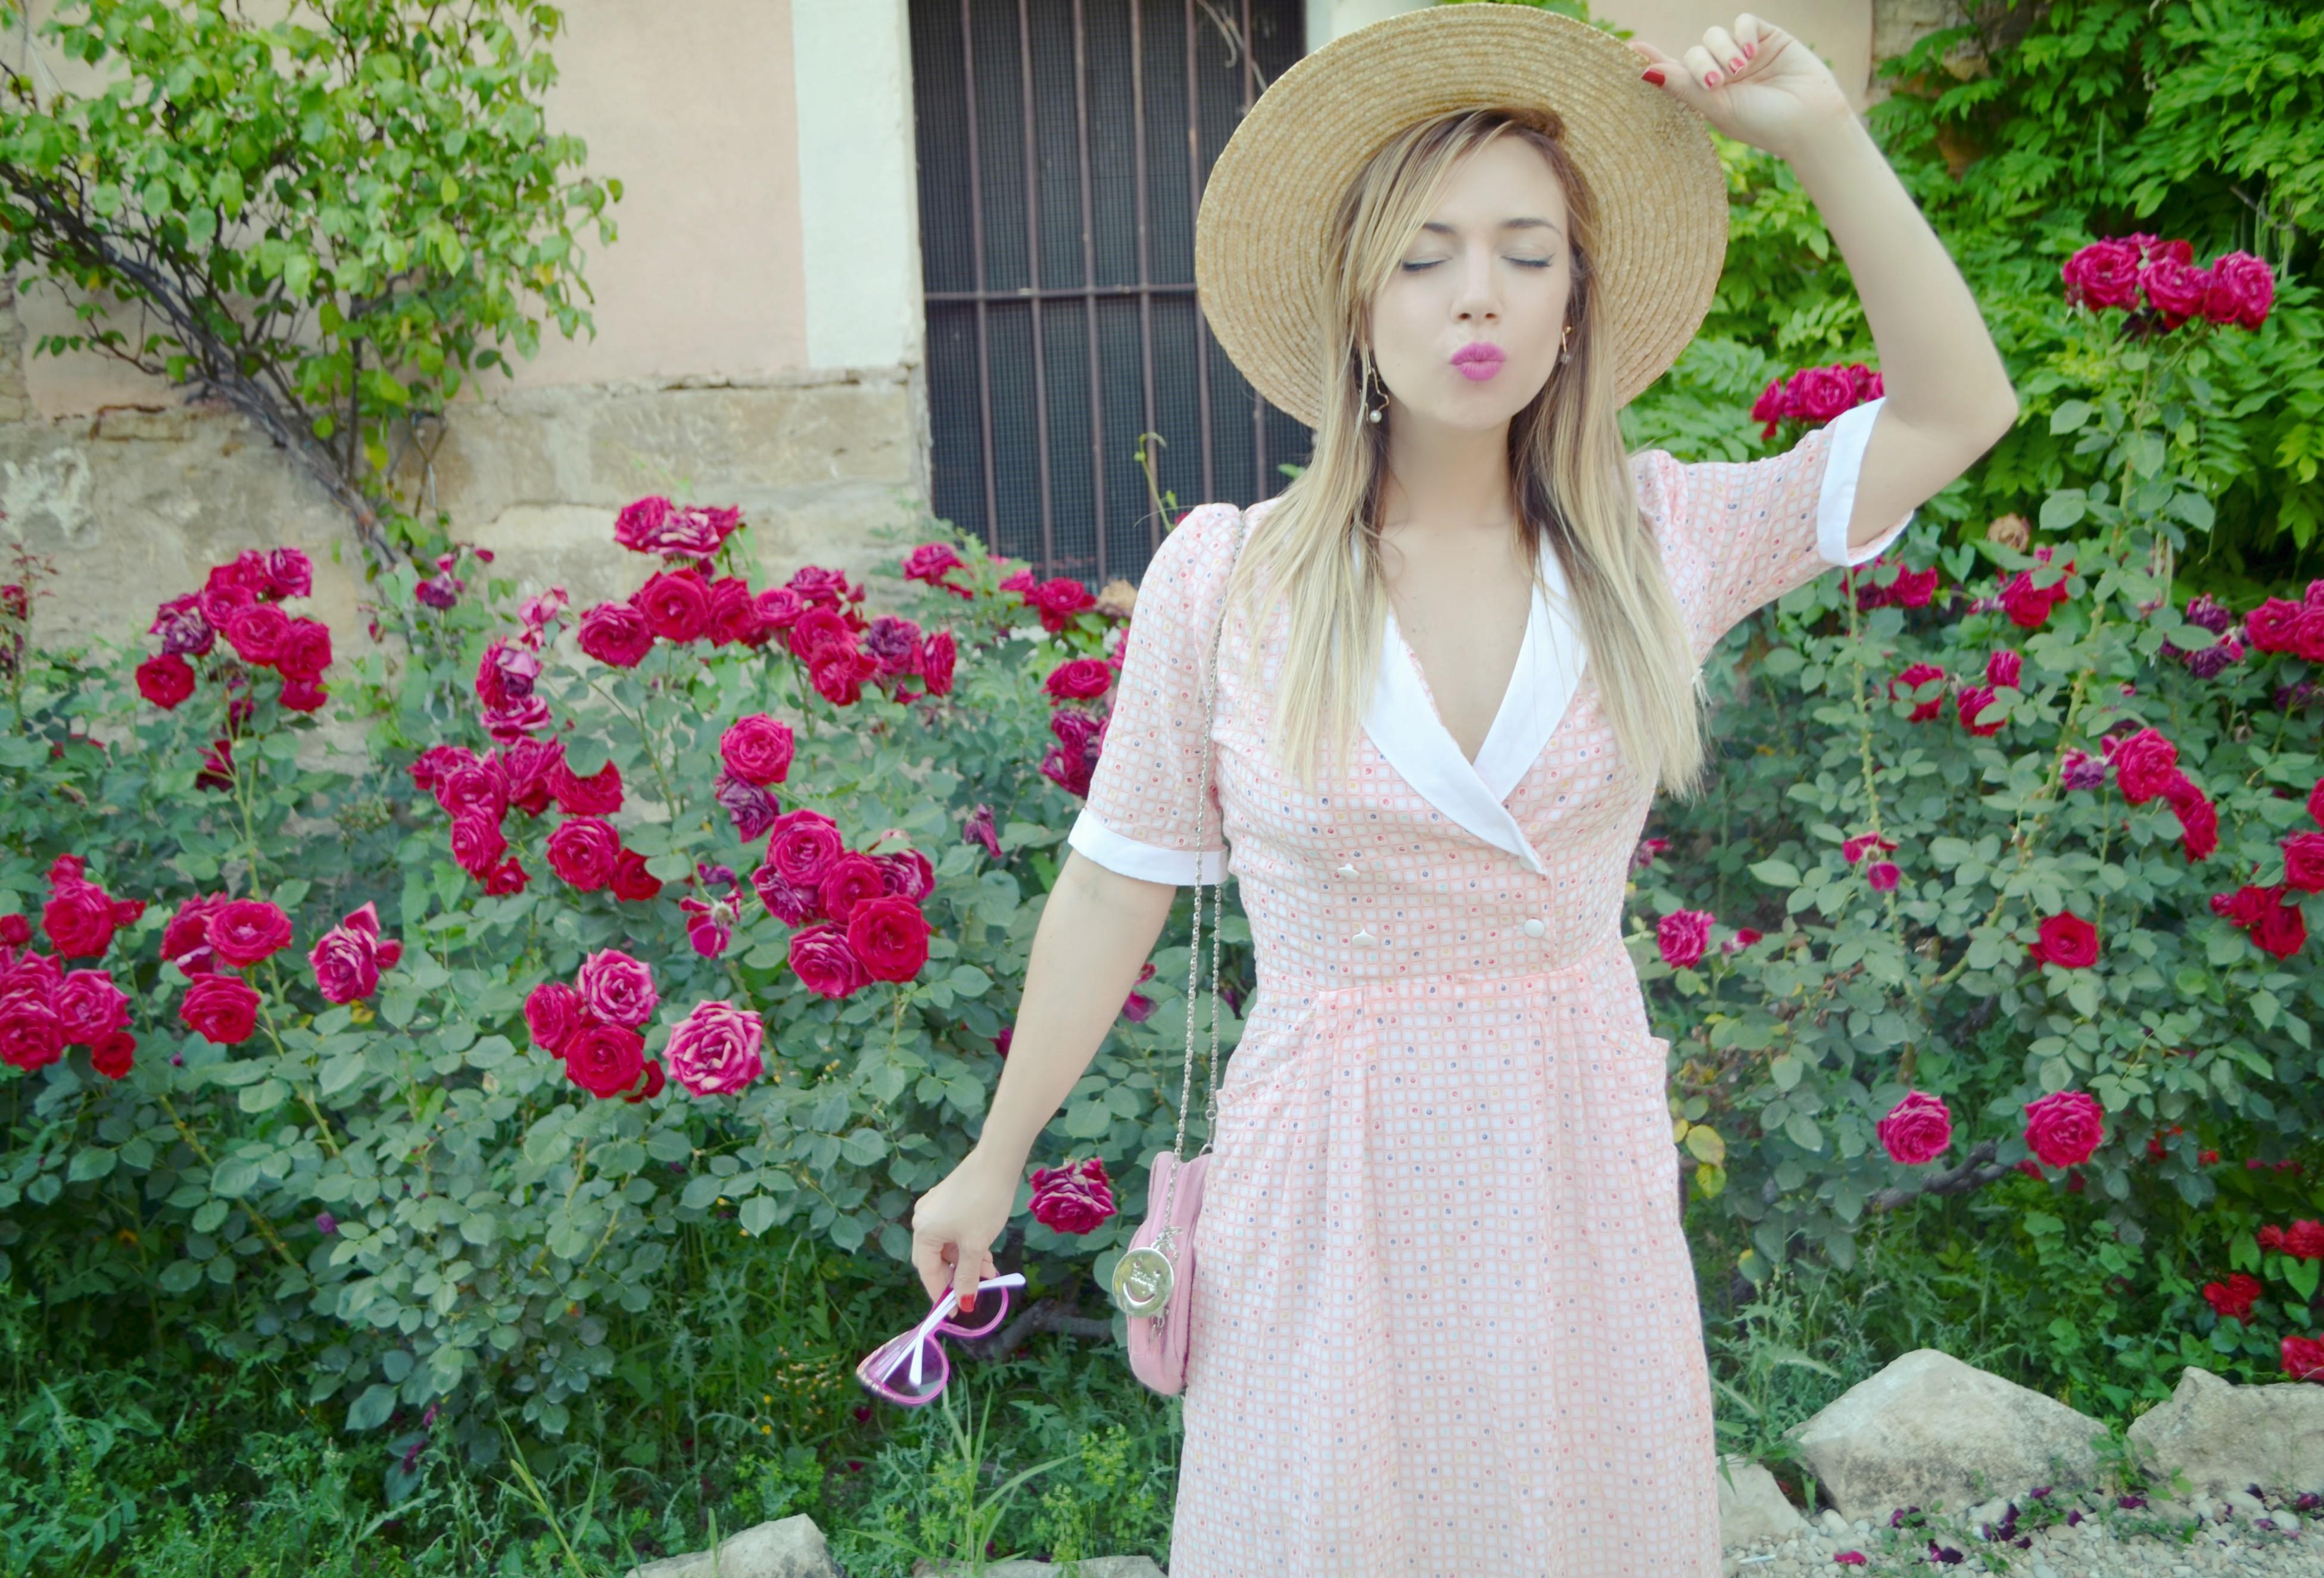 look-retro-picnic-style-blog-de-moda-ChicAdicta-fashionista-Chic-Adicta-viaje-florette-influencers-PiensaenChic-Piensa-en-Chic